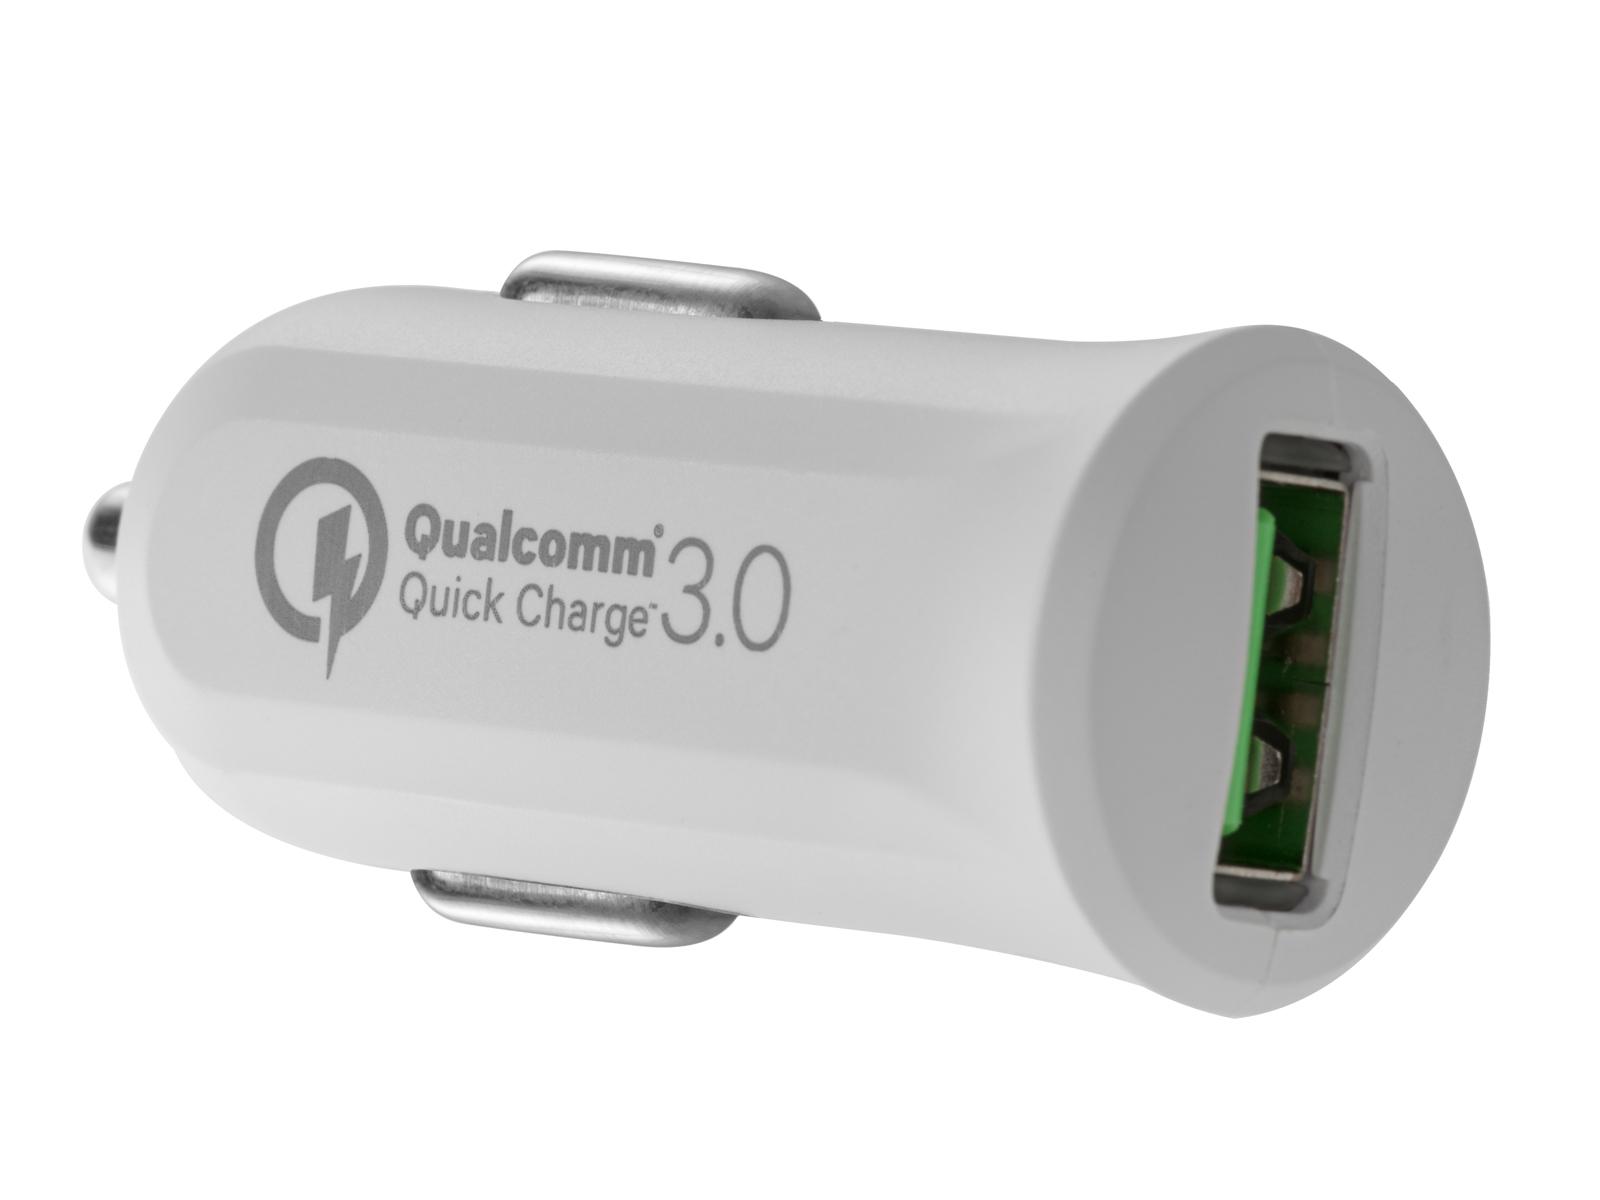 AVACOM CarMAX nabíječka do auta s Qualcomm Quick Charge 3.0, bílá